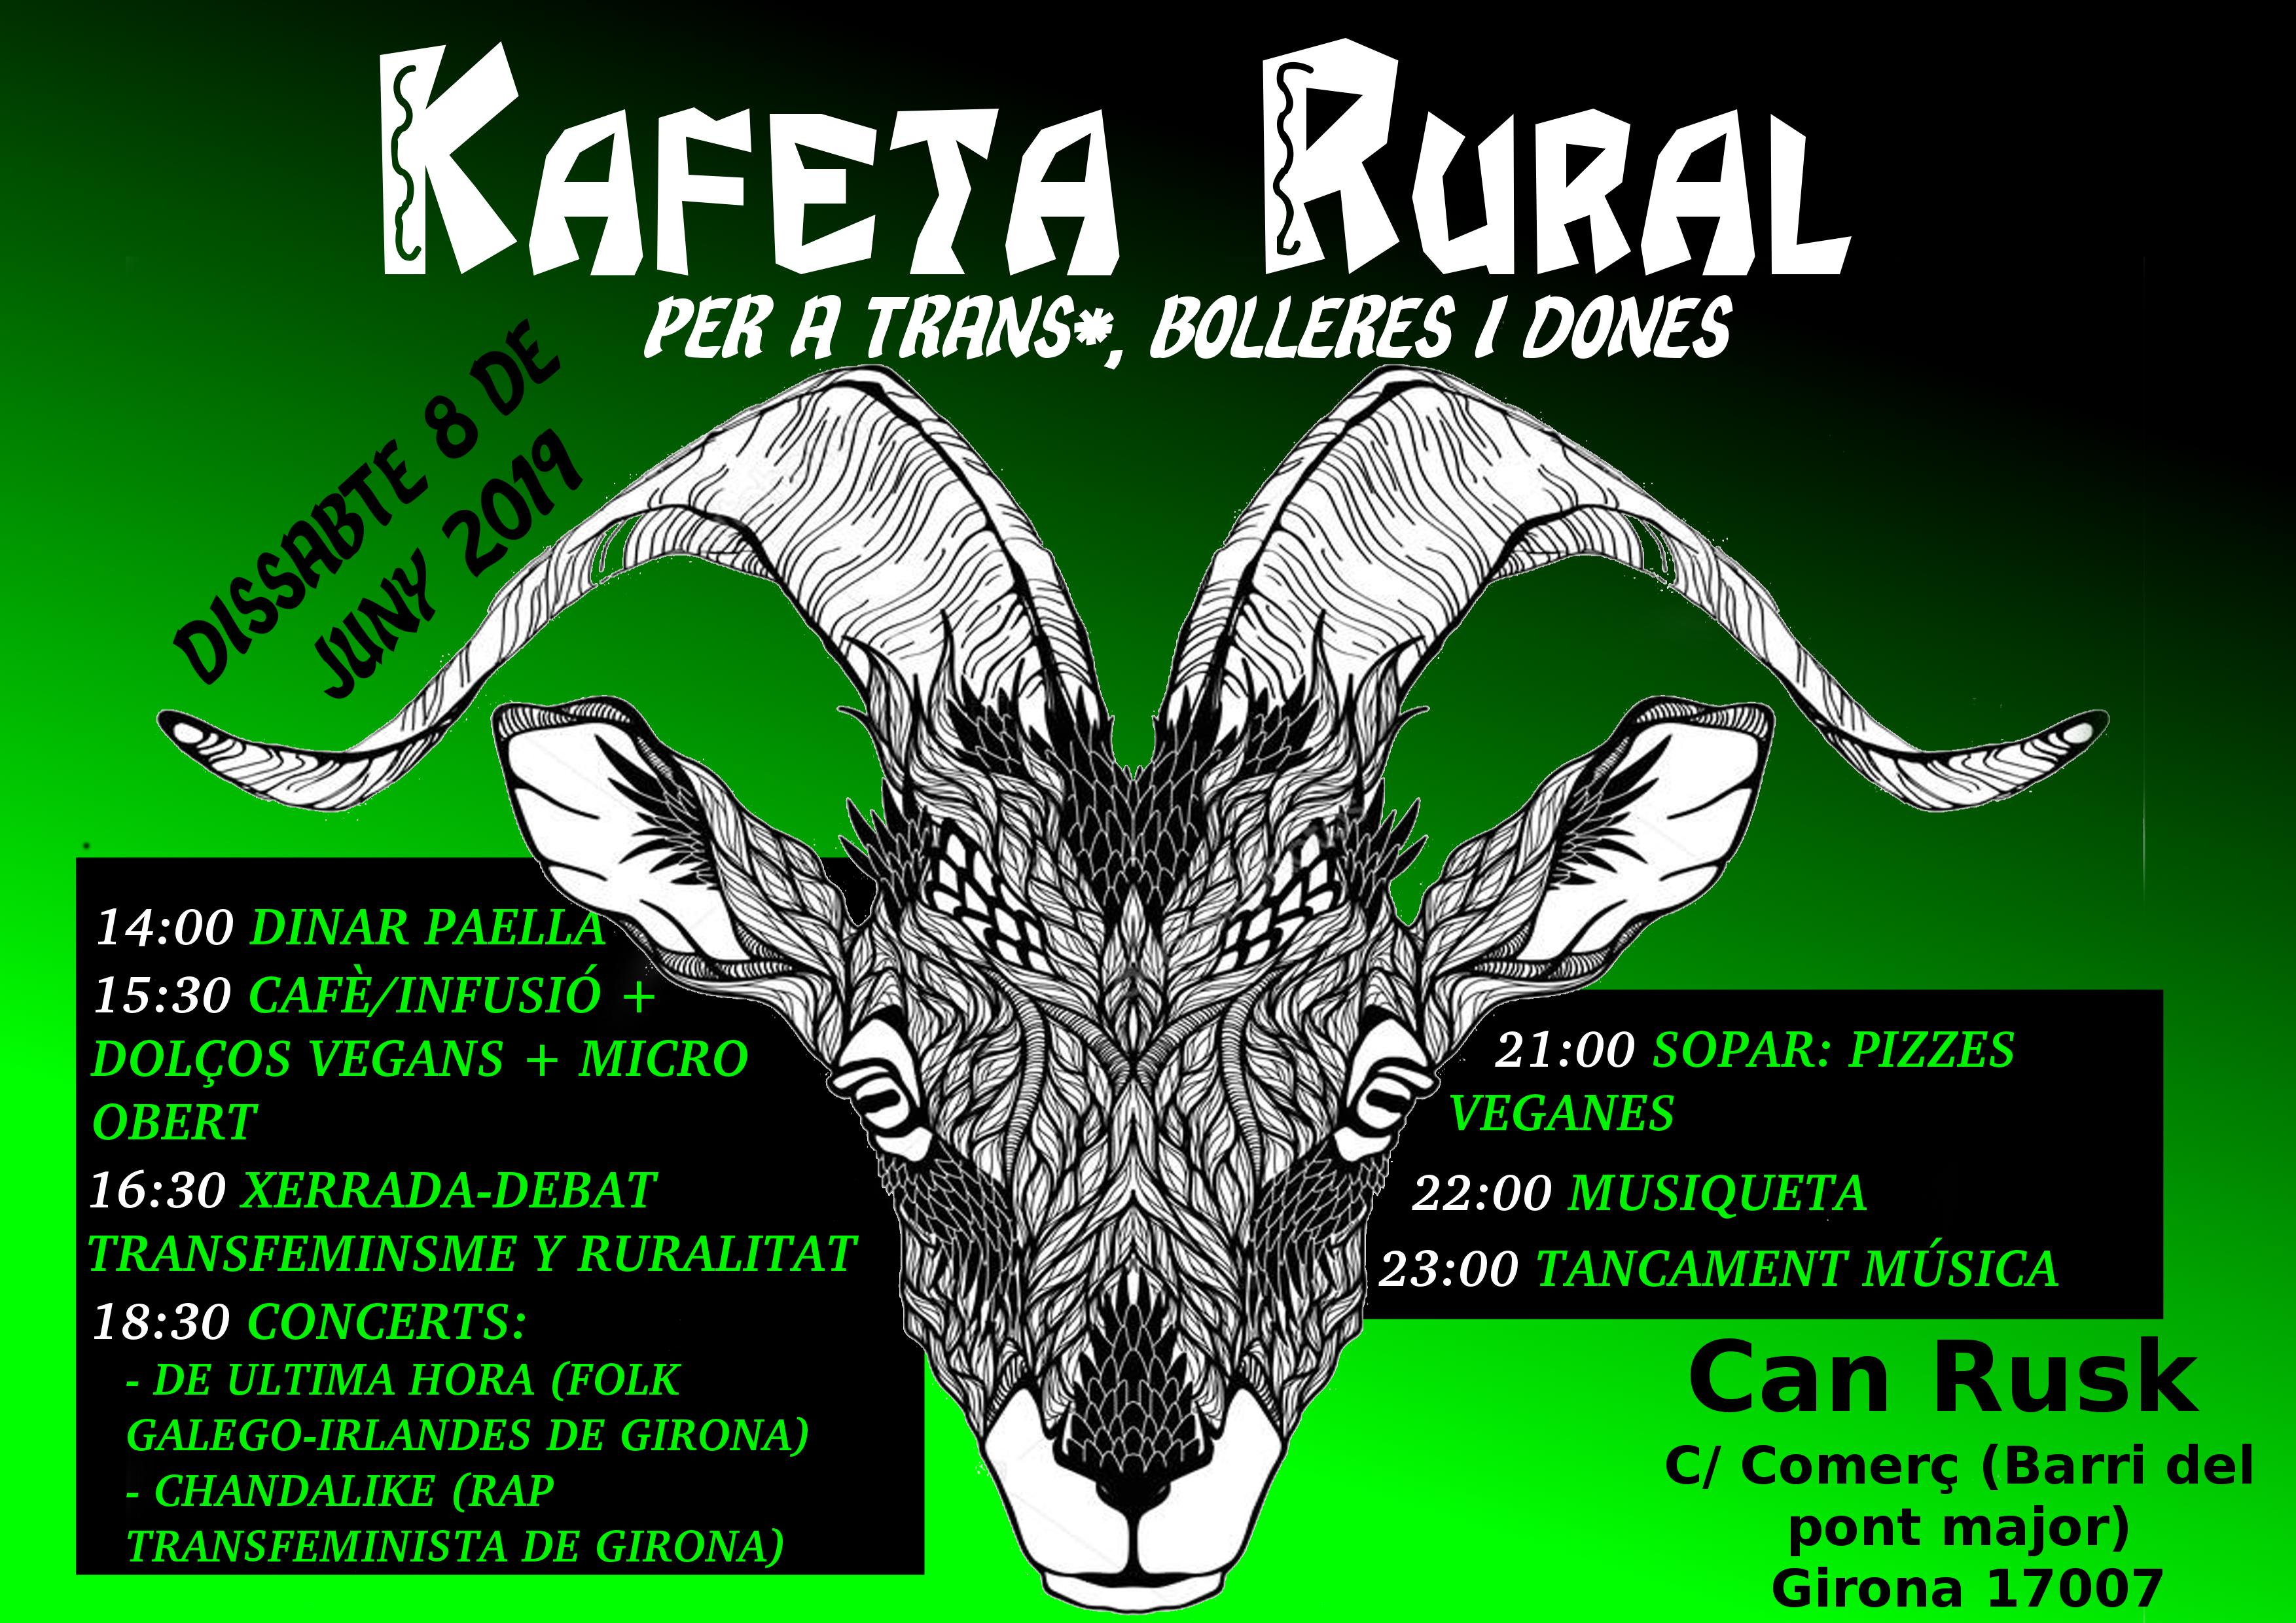 cartell kafeta cabras girona8 juny 2019(2).png